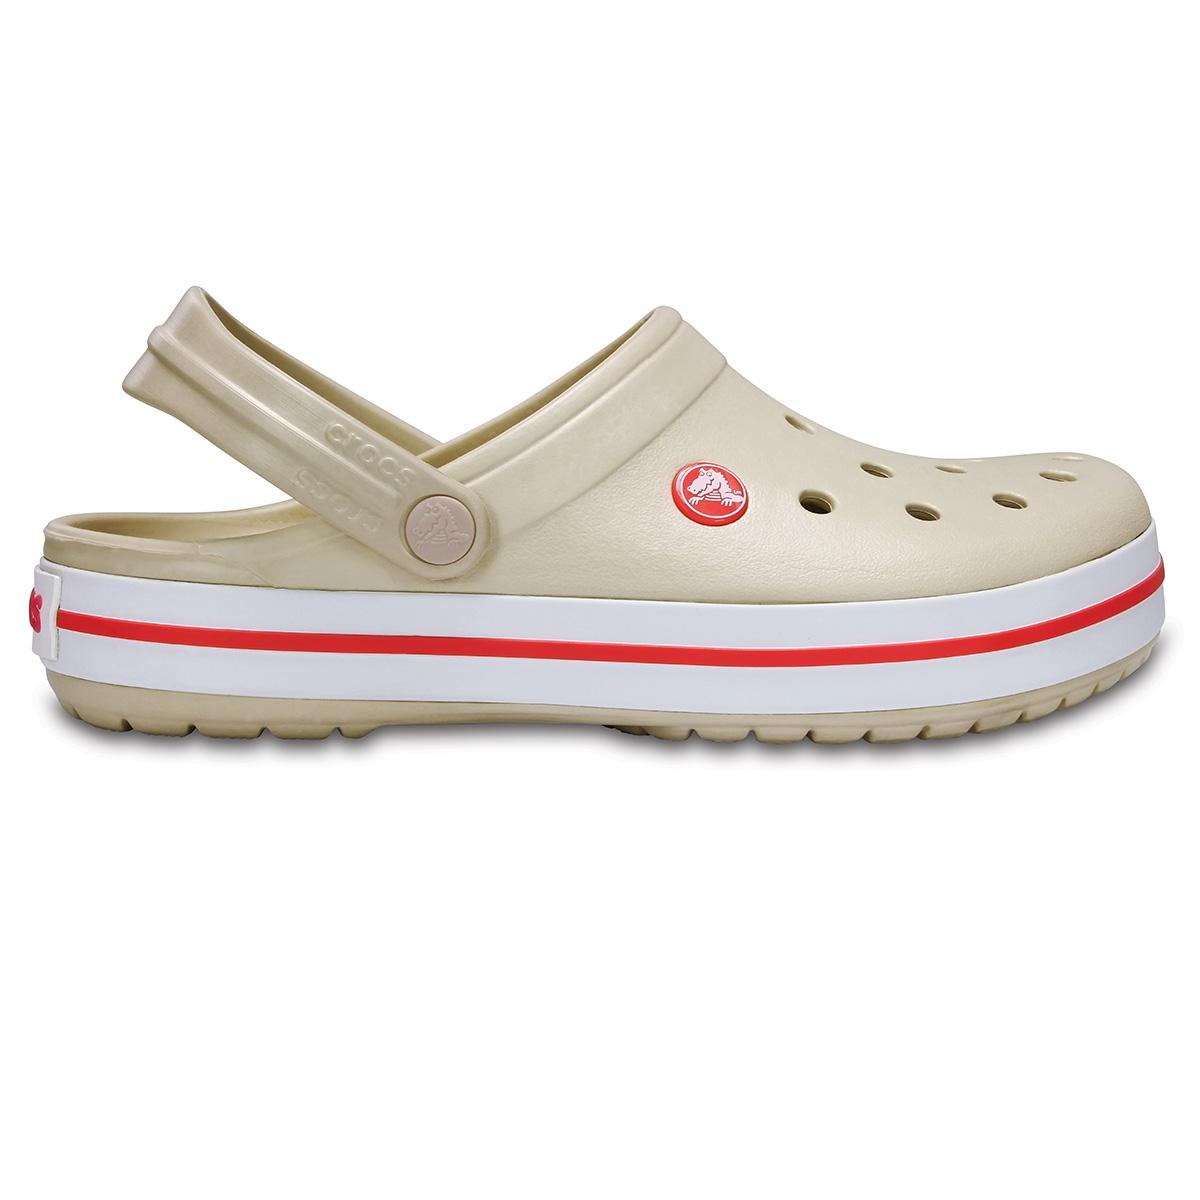 Crocs Crocband - Alçı/Kavun